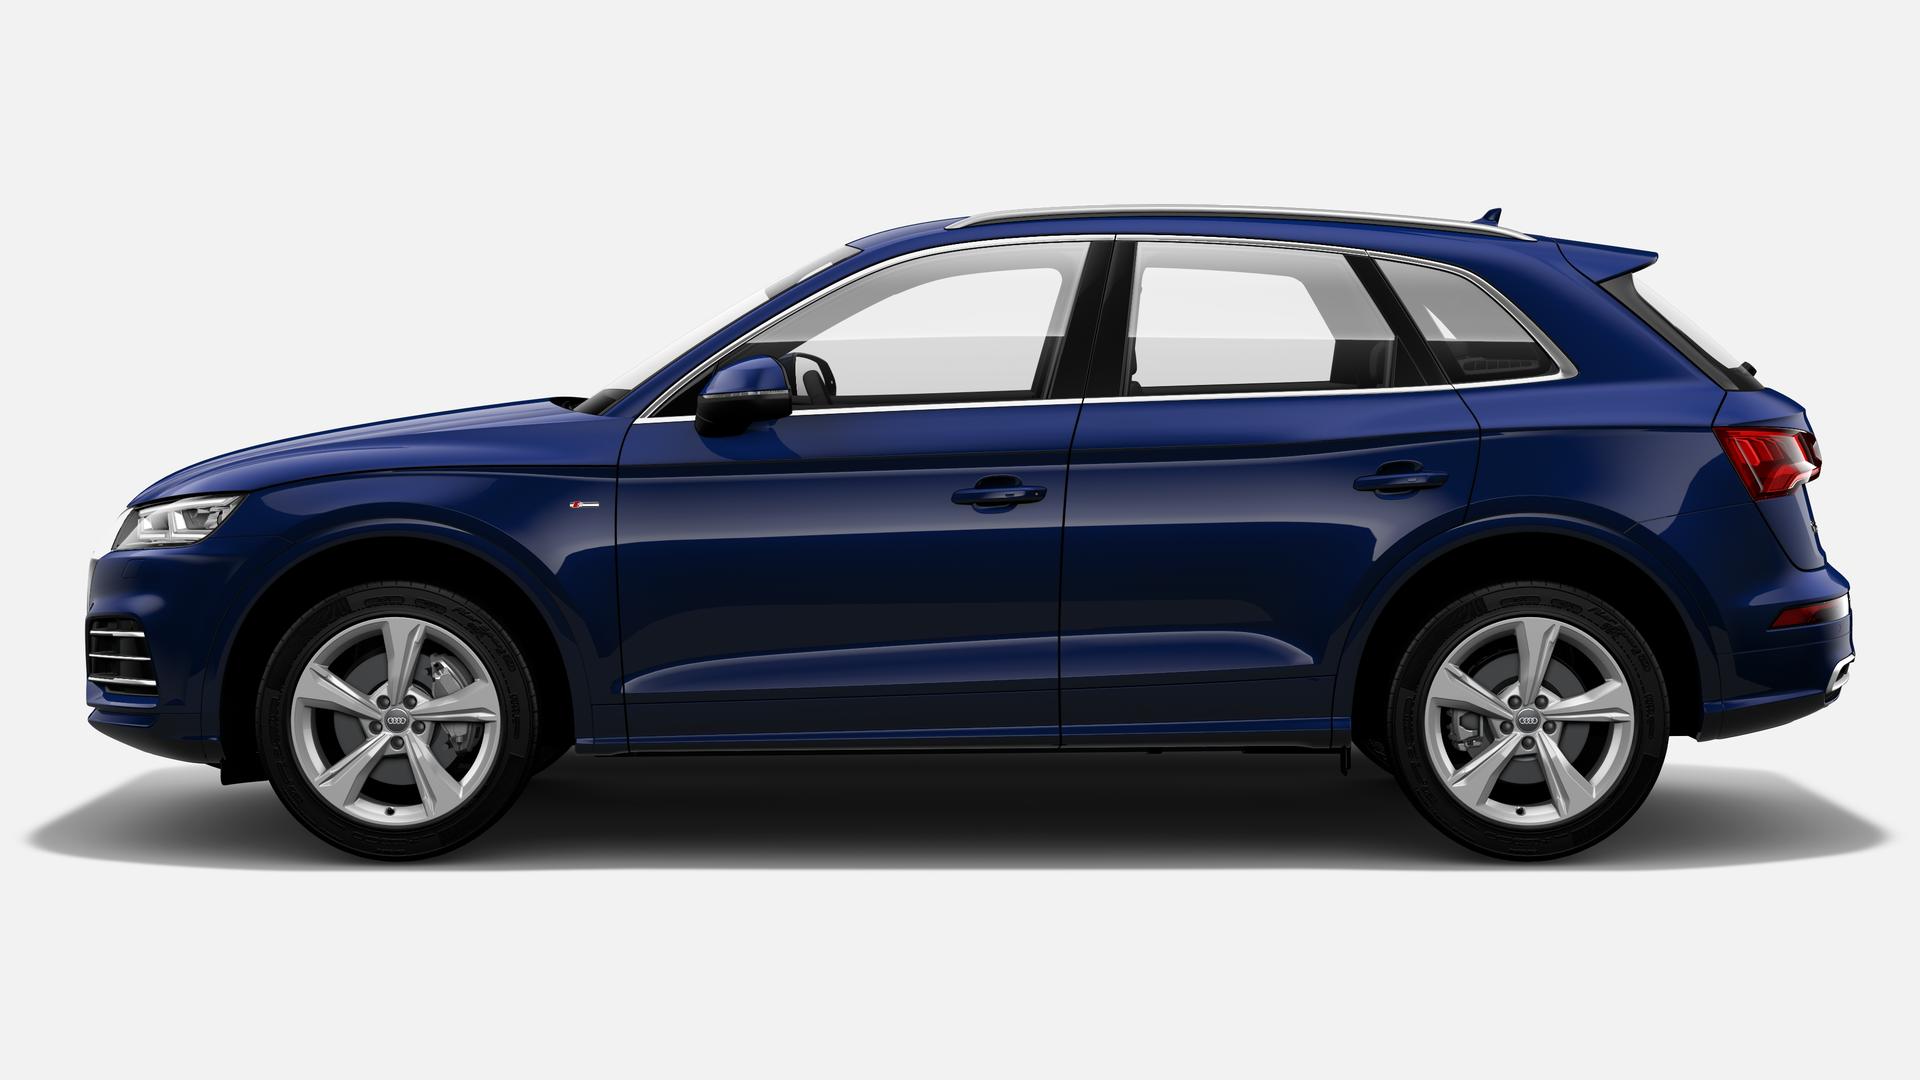 Vista Lateral izquierda de Audi Q5 40 TDI S Line Quattro S Tronic 140 kW (190 CV)